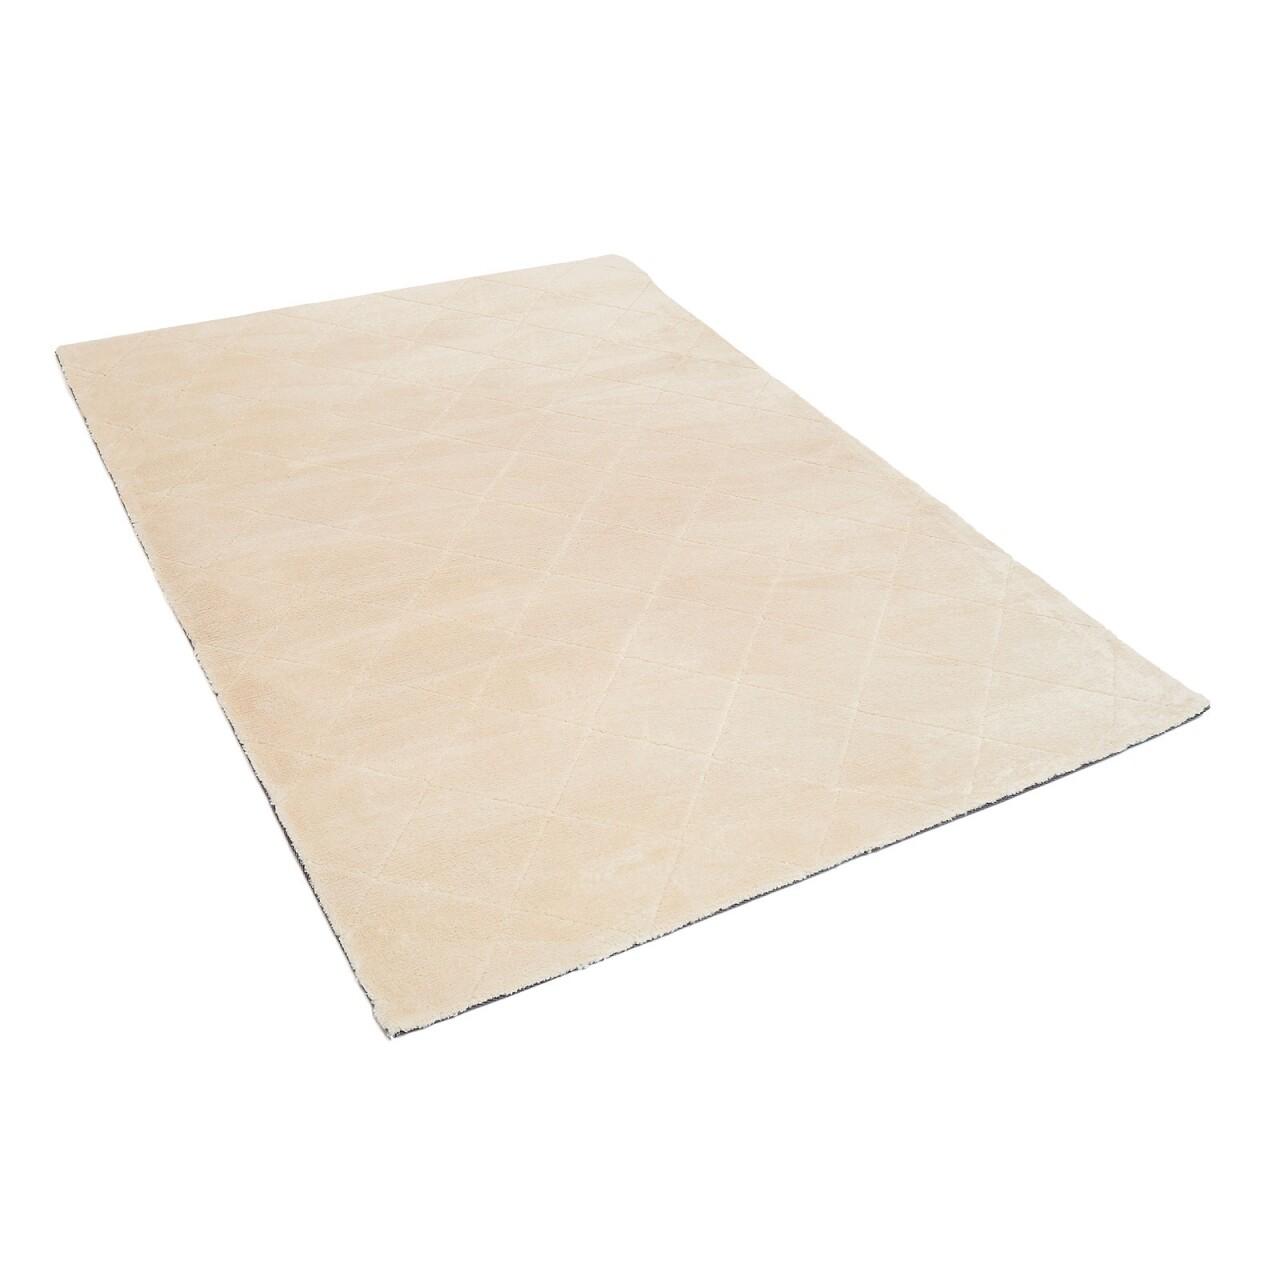 Covor Shaggy Soft, Heinner, 160 x 230 cm, 100% poliester, bej